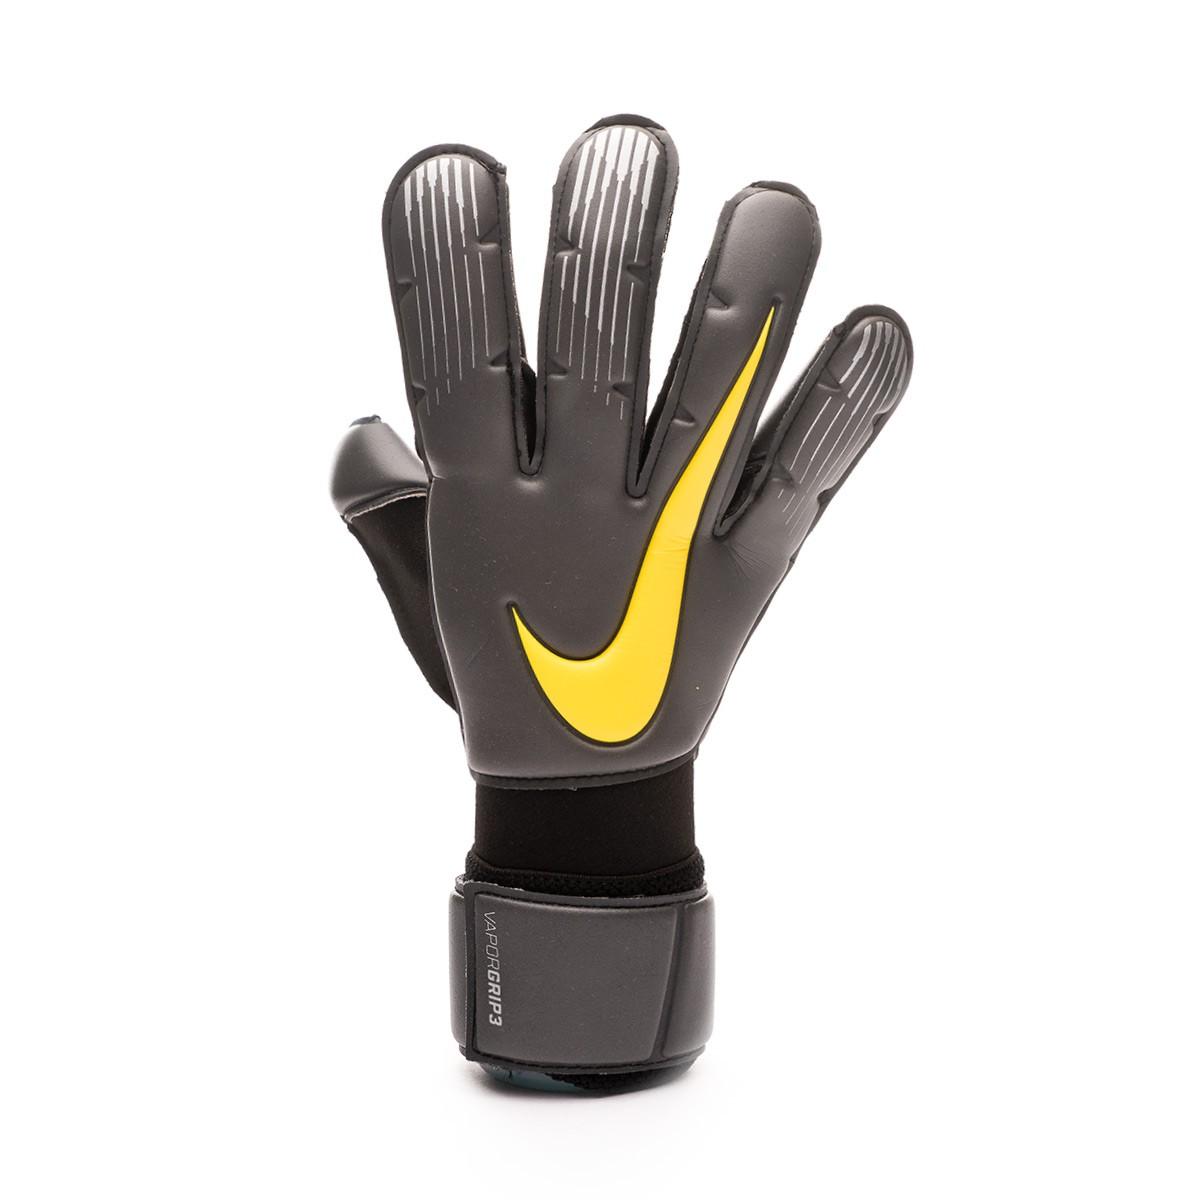 tofu suma lógica  Guante de portero Nike Vapor Grip 3 Anthracite-Black-Optical yellow -  Tienda de fútbol Fútbol Emotion